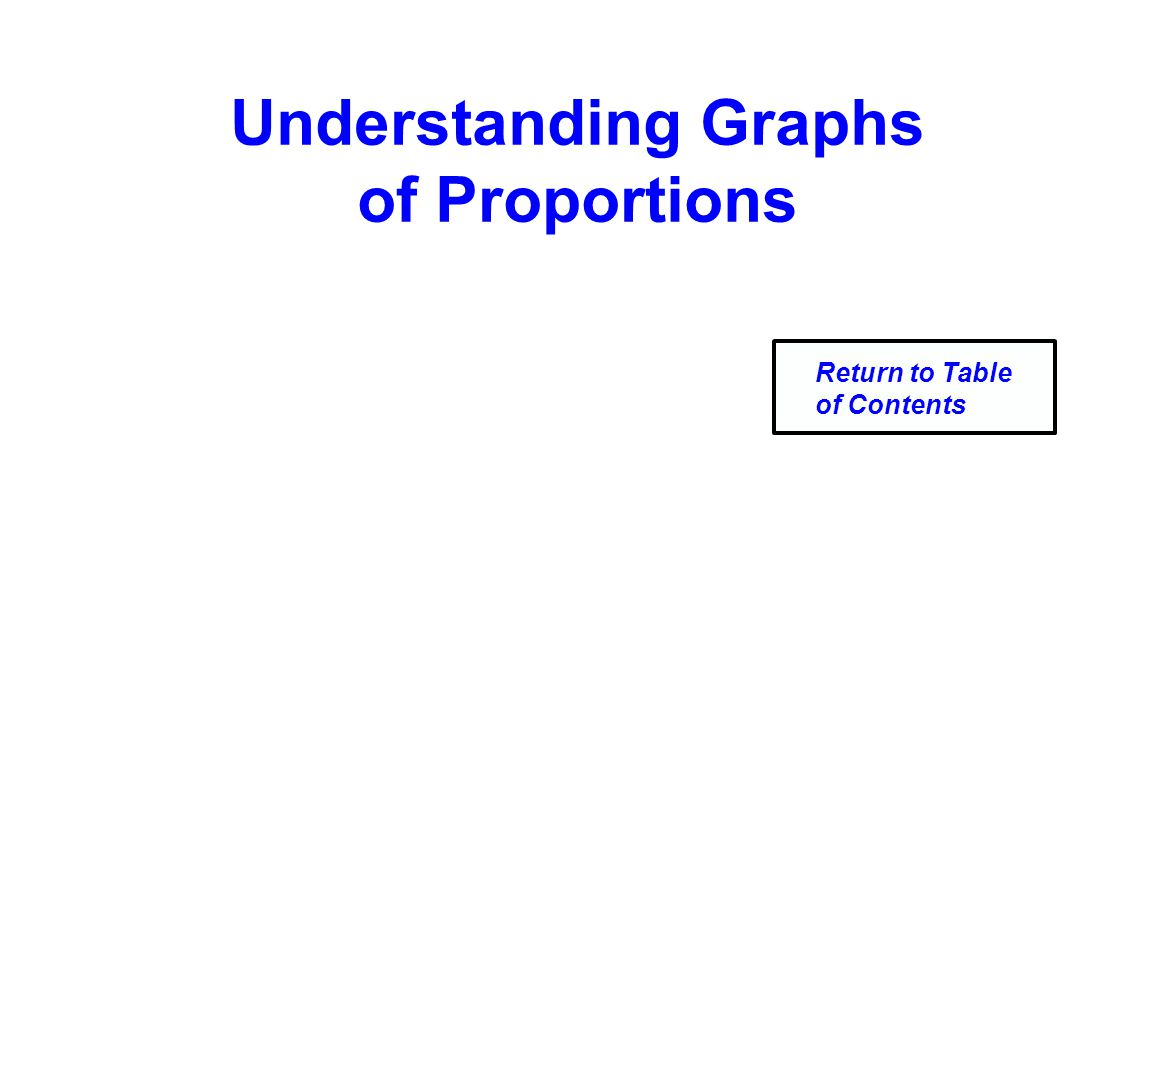 Understanding Graphs of Proportions